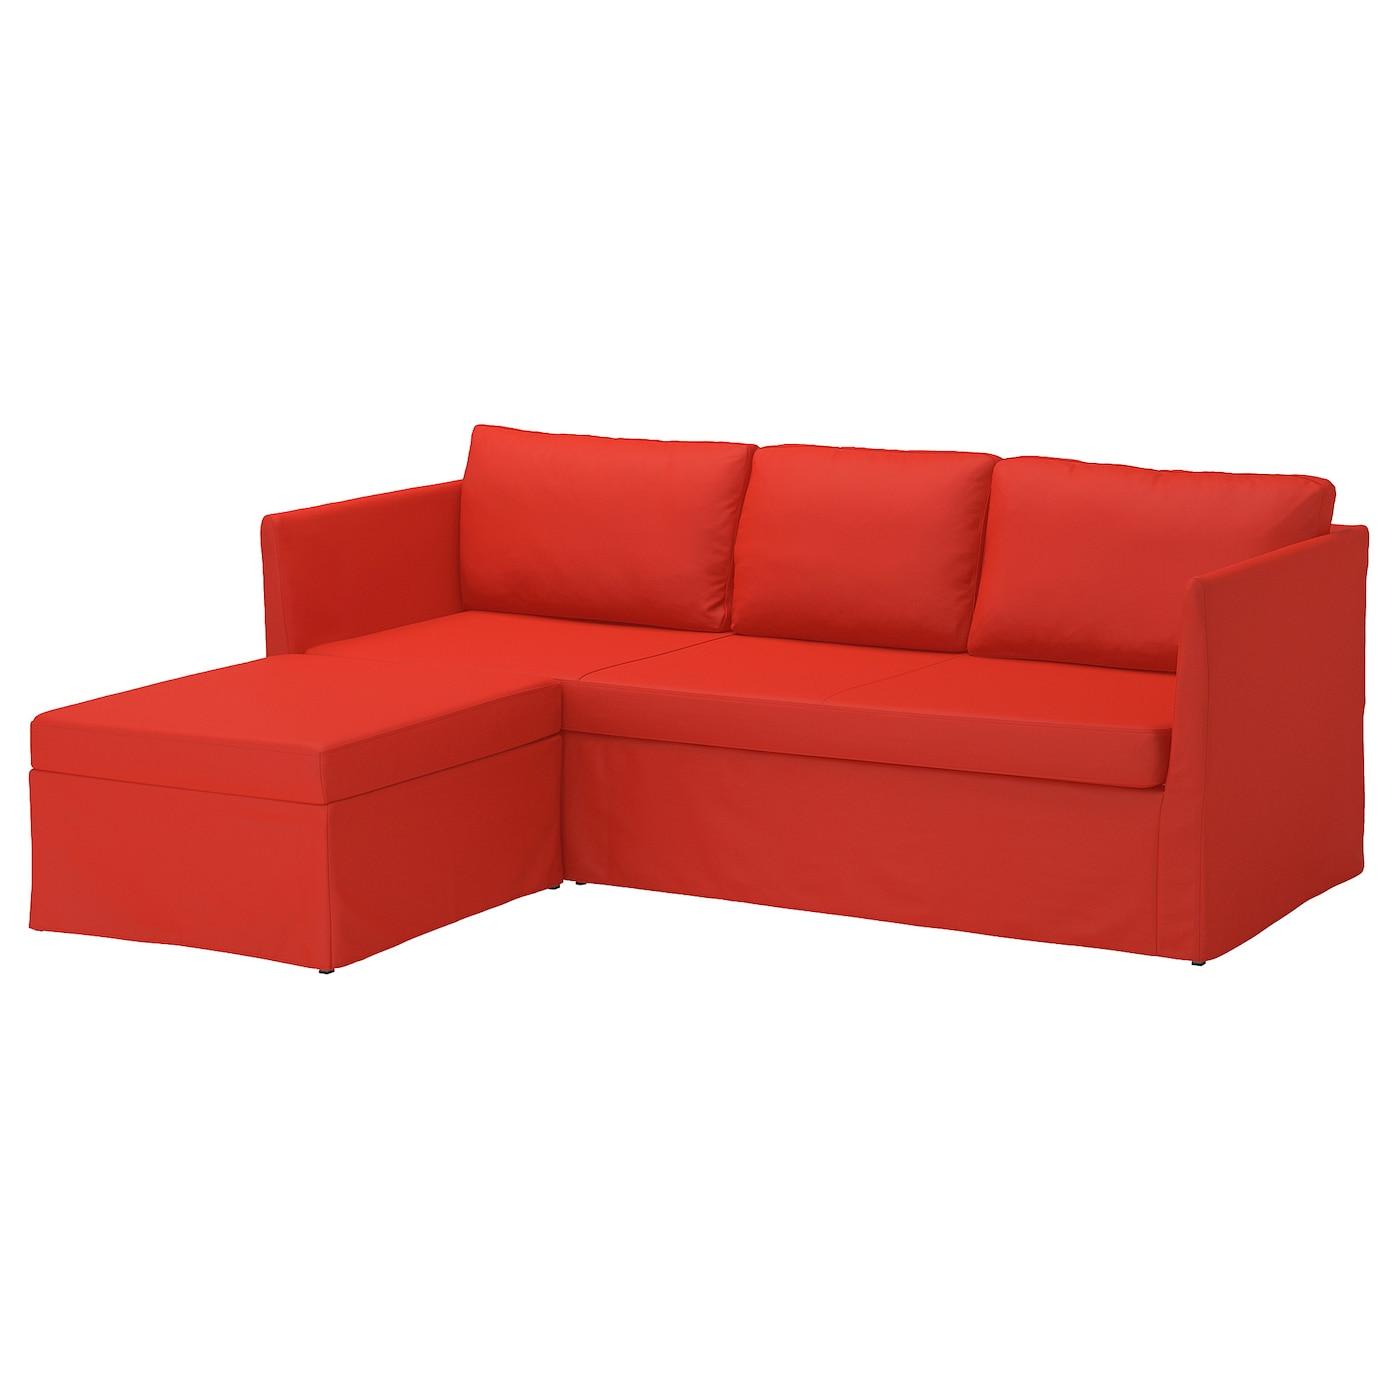 Brathult corner sofa bed vissle red orange ikea for Red sectional sofa ikea